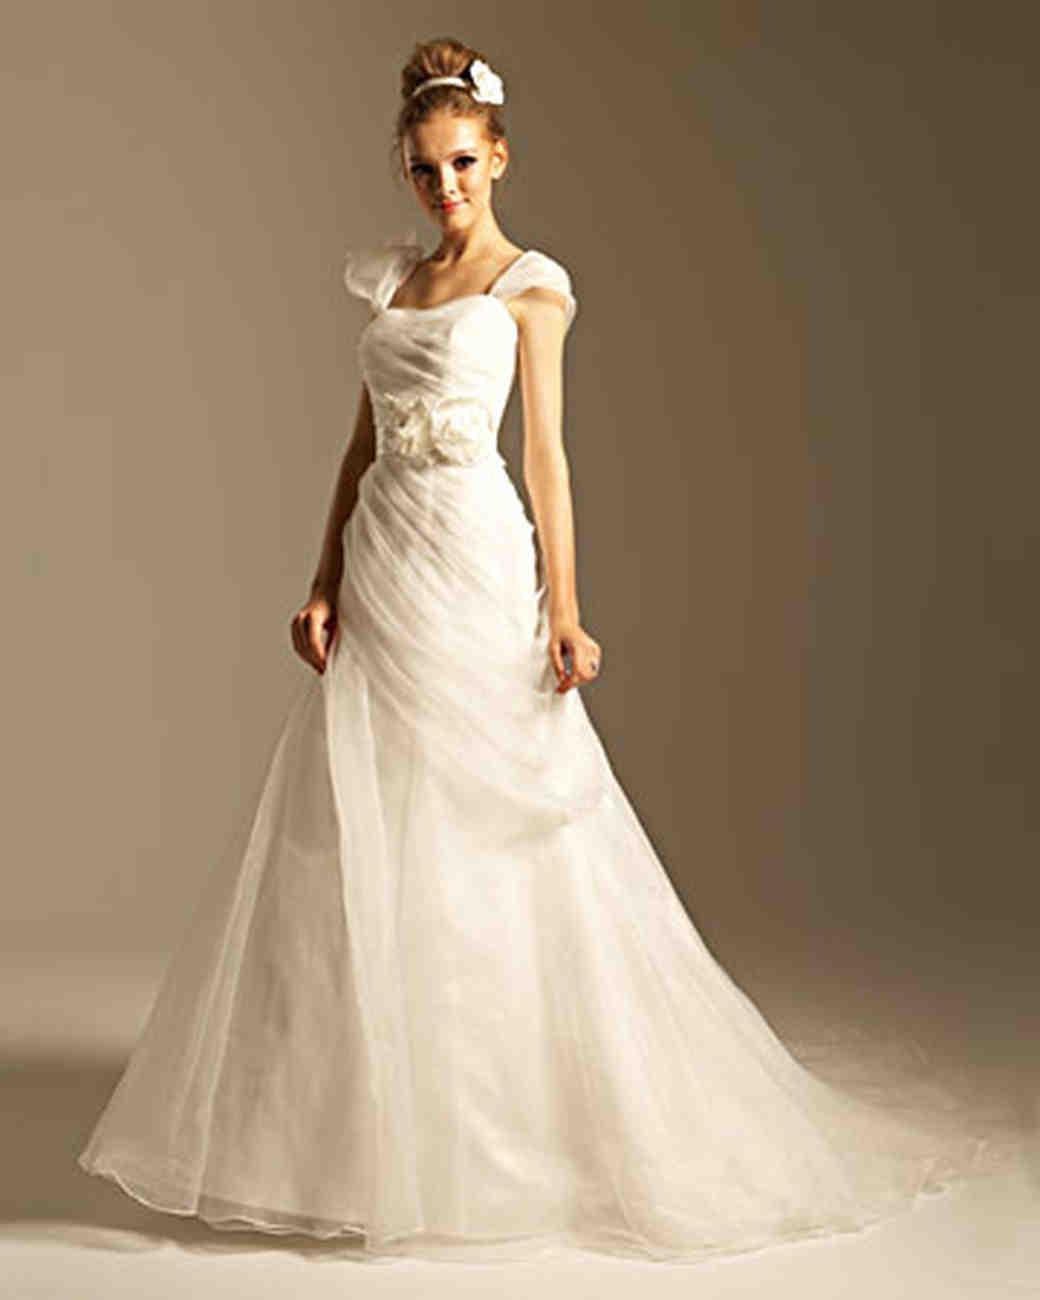 Jcpenny Wedding Dress - Vosoi.com